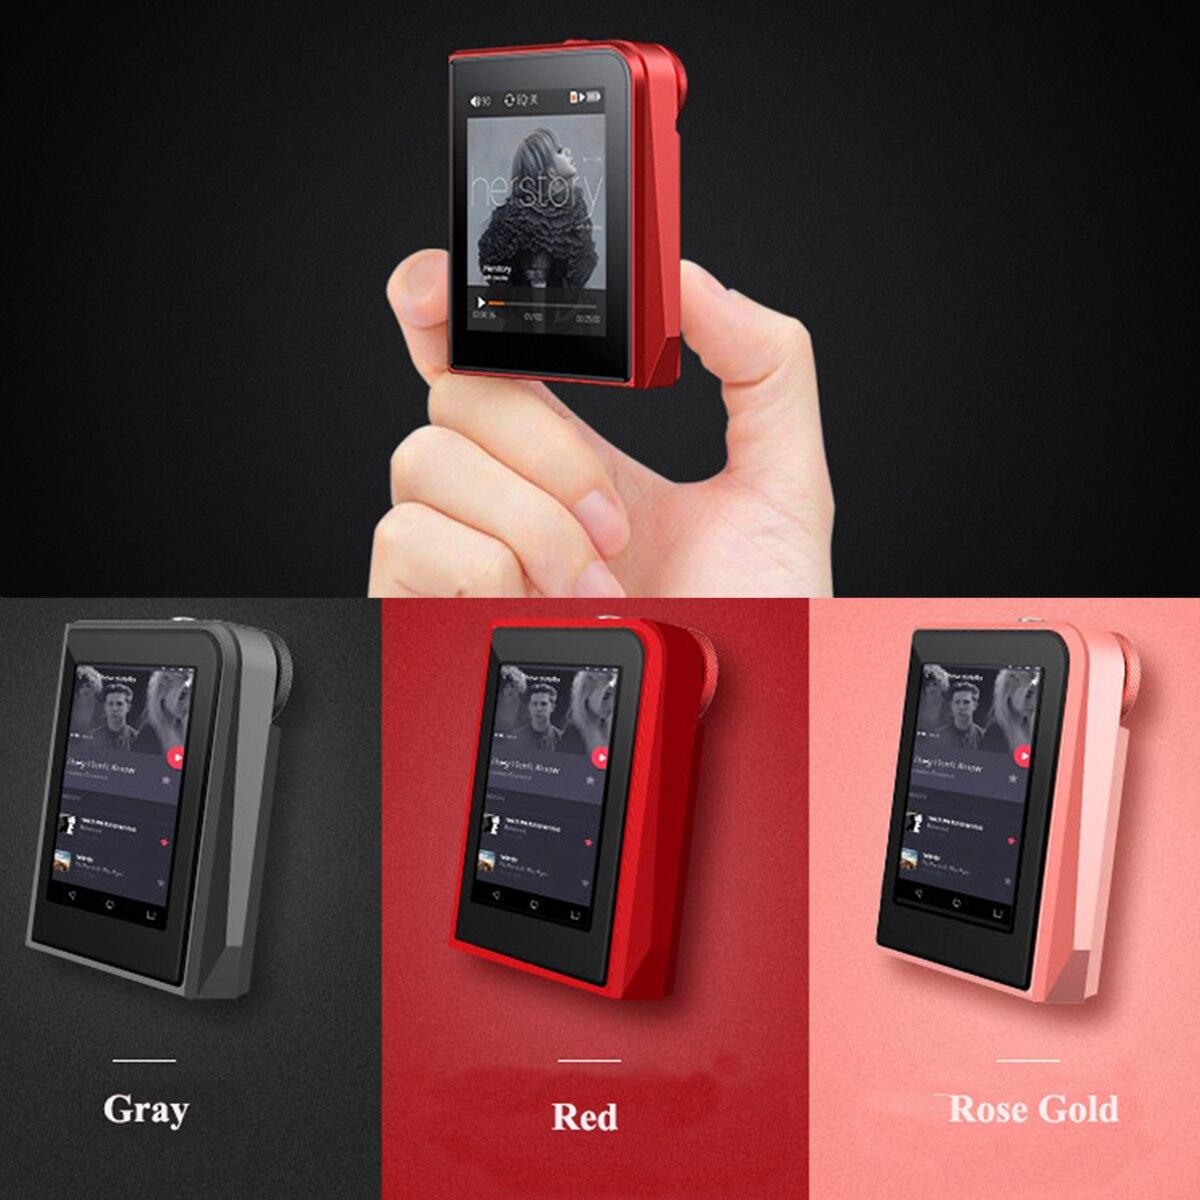 Mp3 player RUIZU A50 MP3 chave leitor de música walkman tela TFT 8 GB Apoio 28 língua Android MP3 WMA JPG WAV BMP